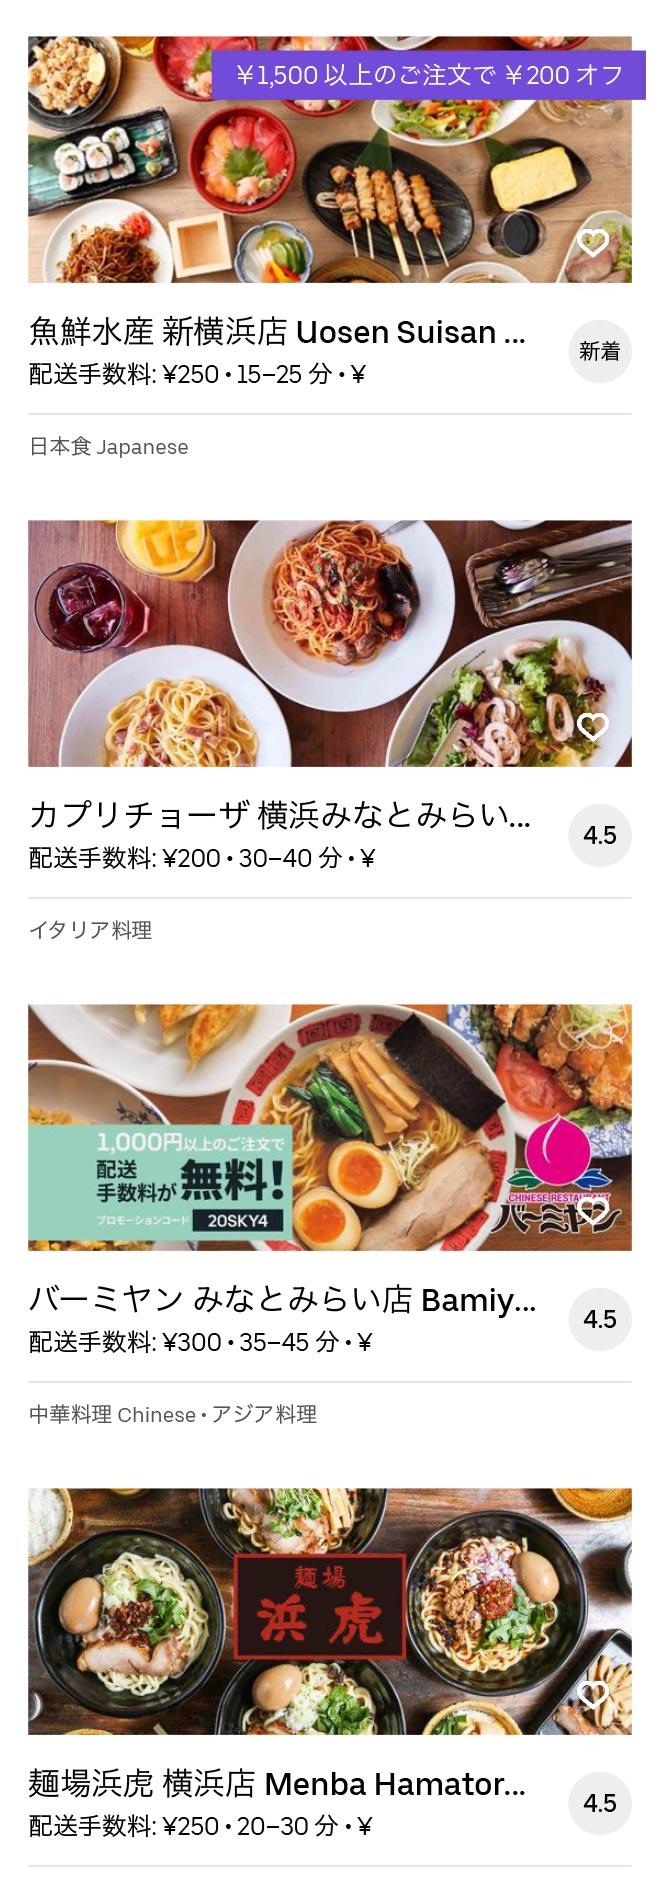 Yokohama hakuraku menu 2004 11